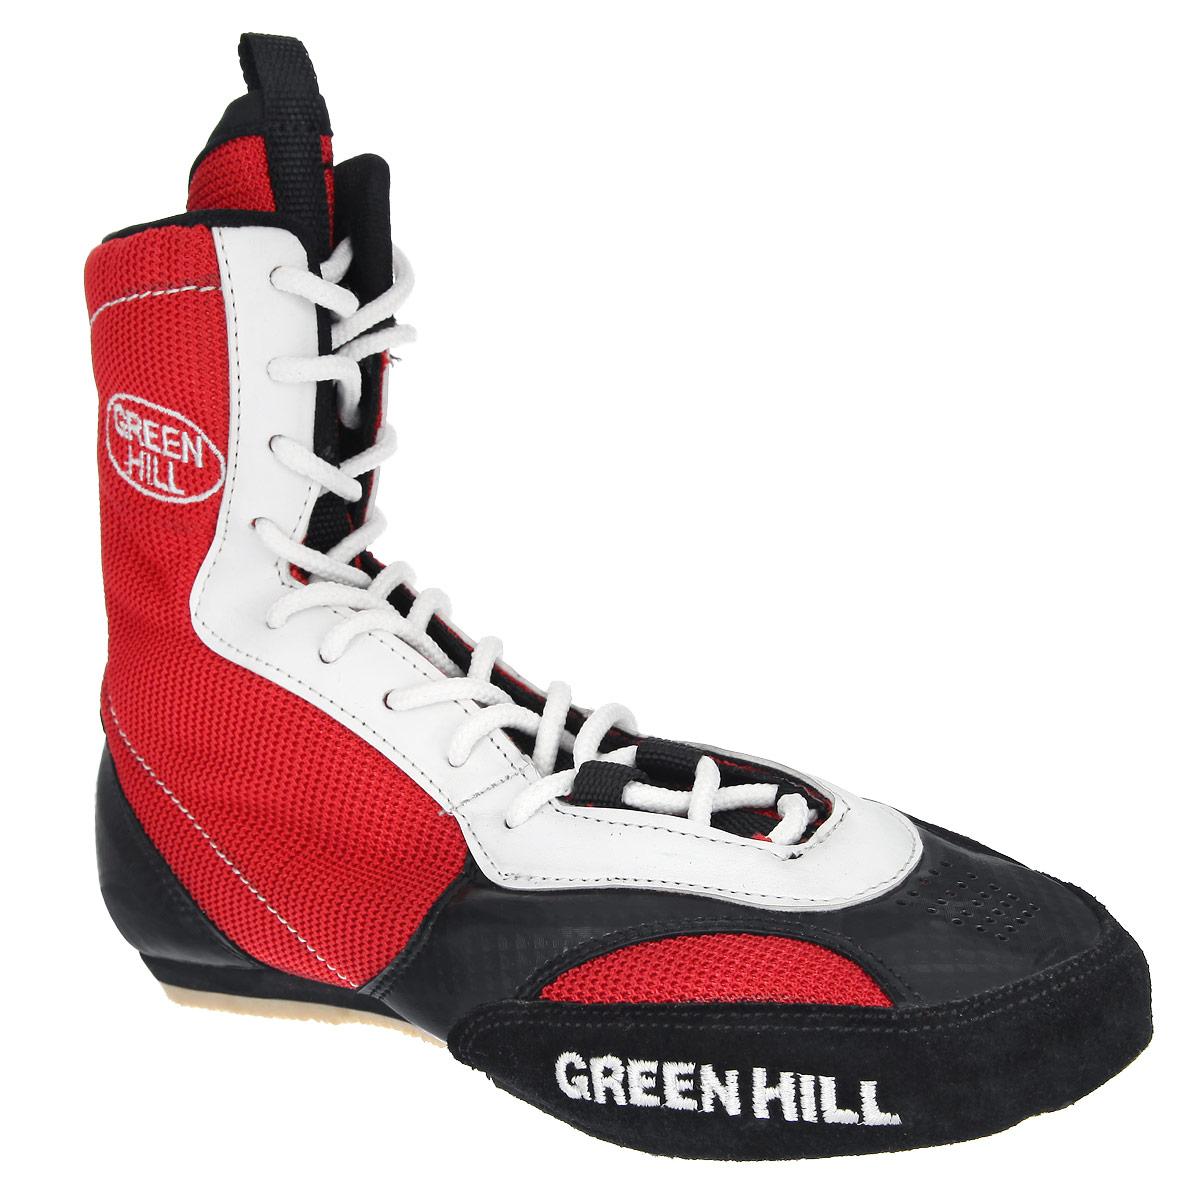 Боксерки Green Hill, цвет: красный. BS-0001. Размер 36